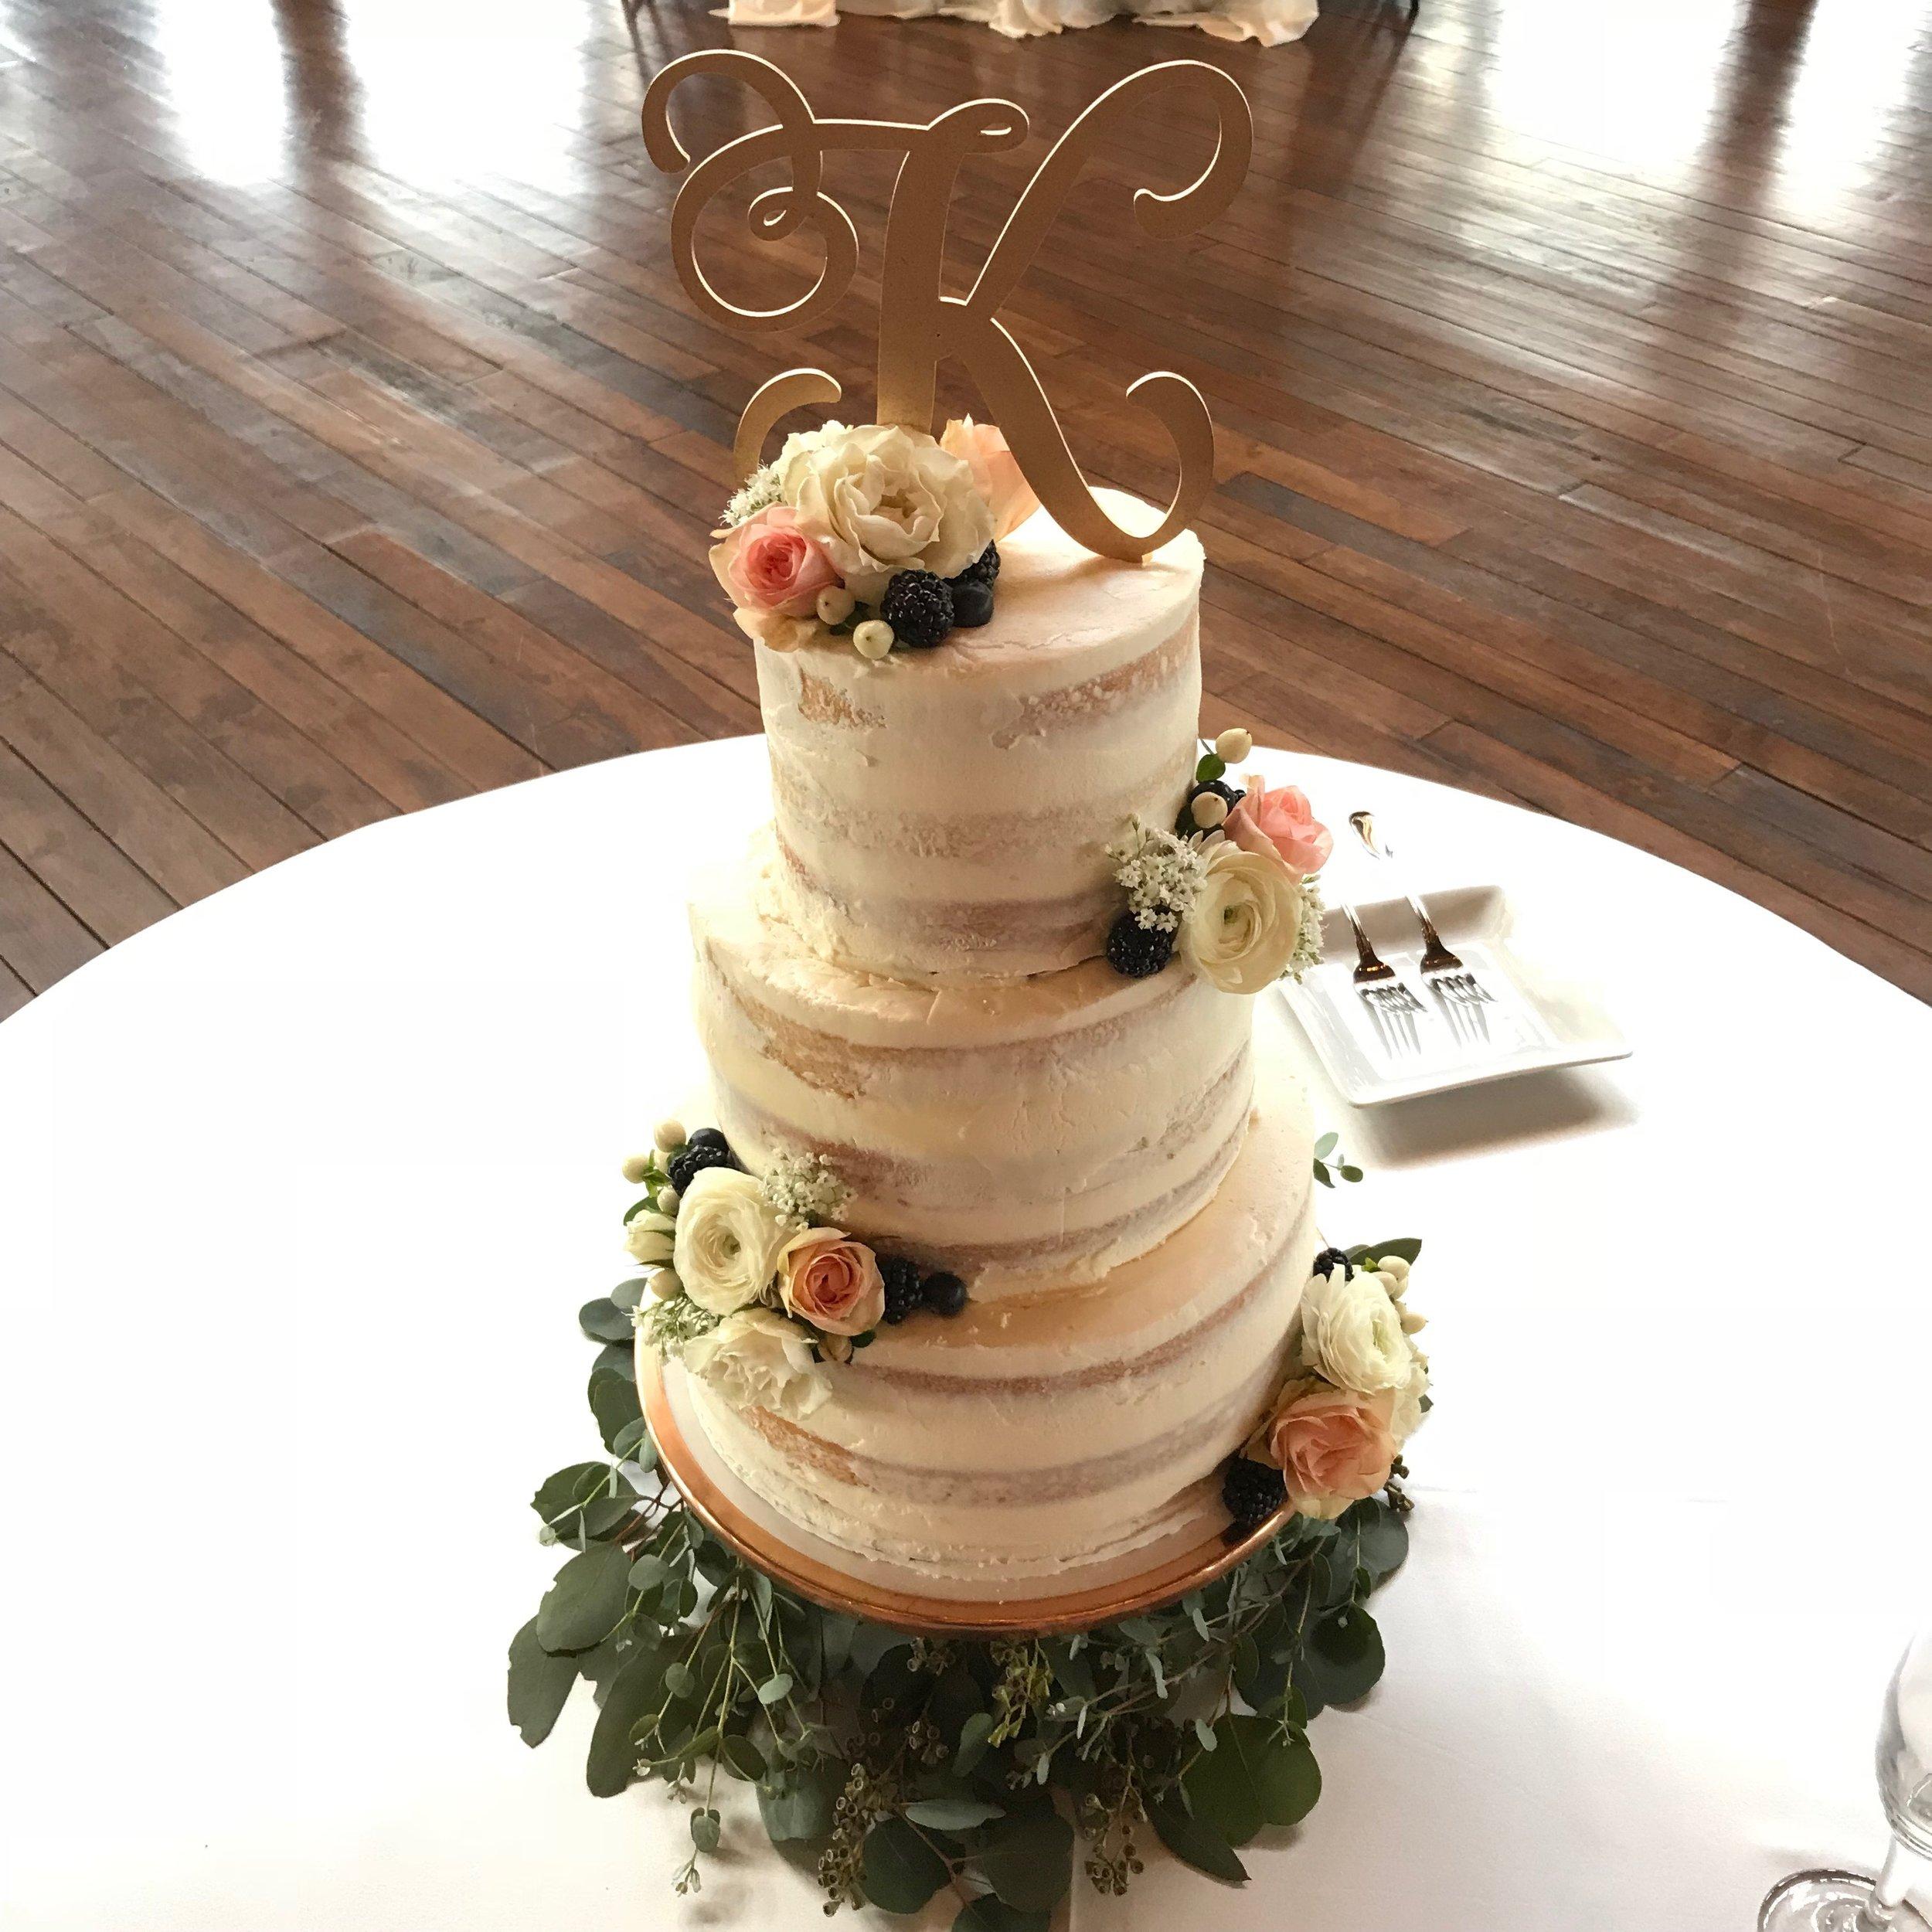 Liz & Michael Cake by DJ Jim Cerone